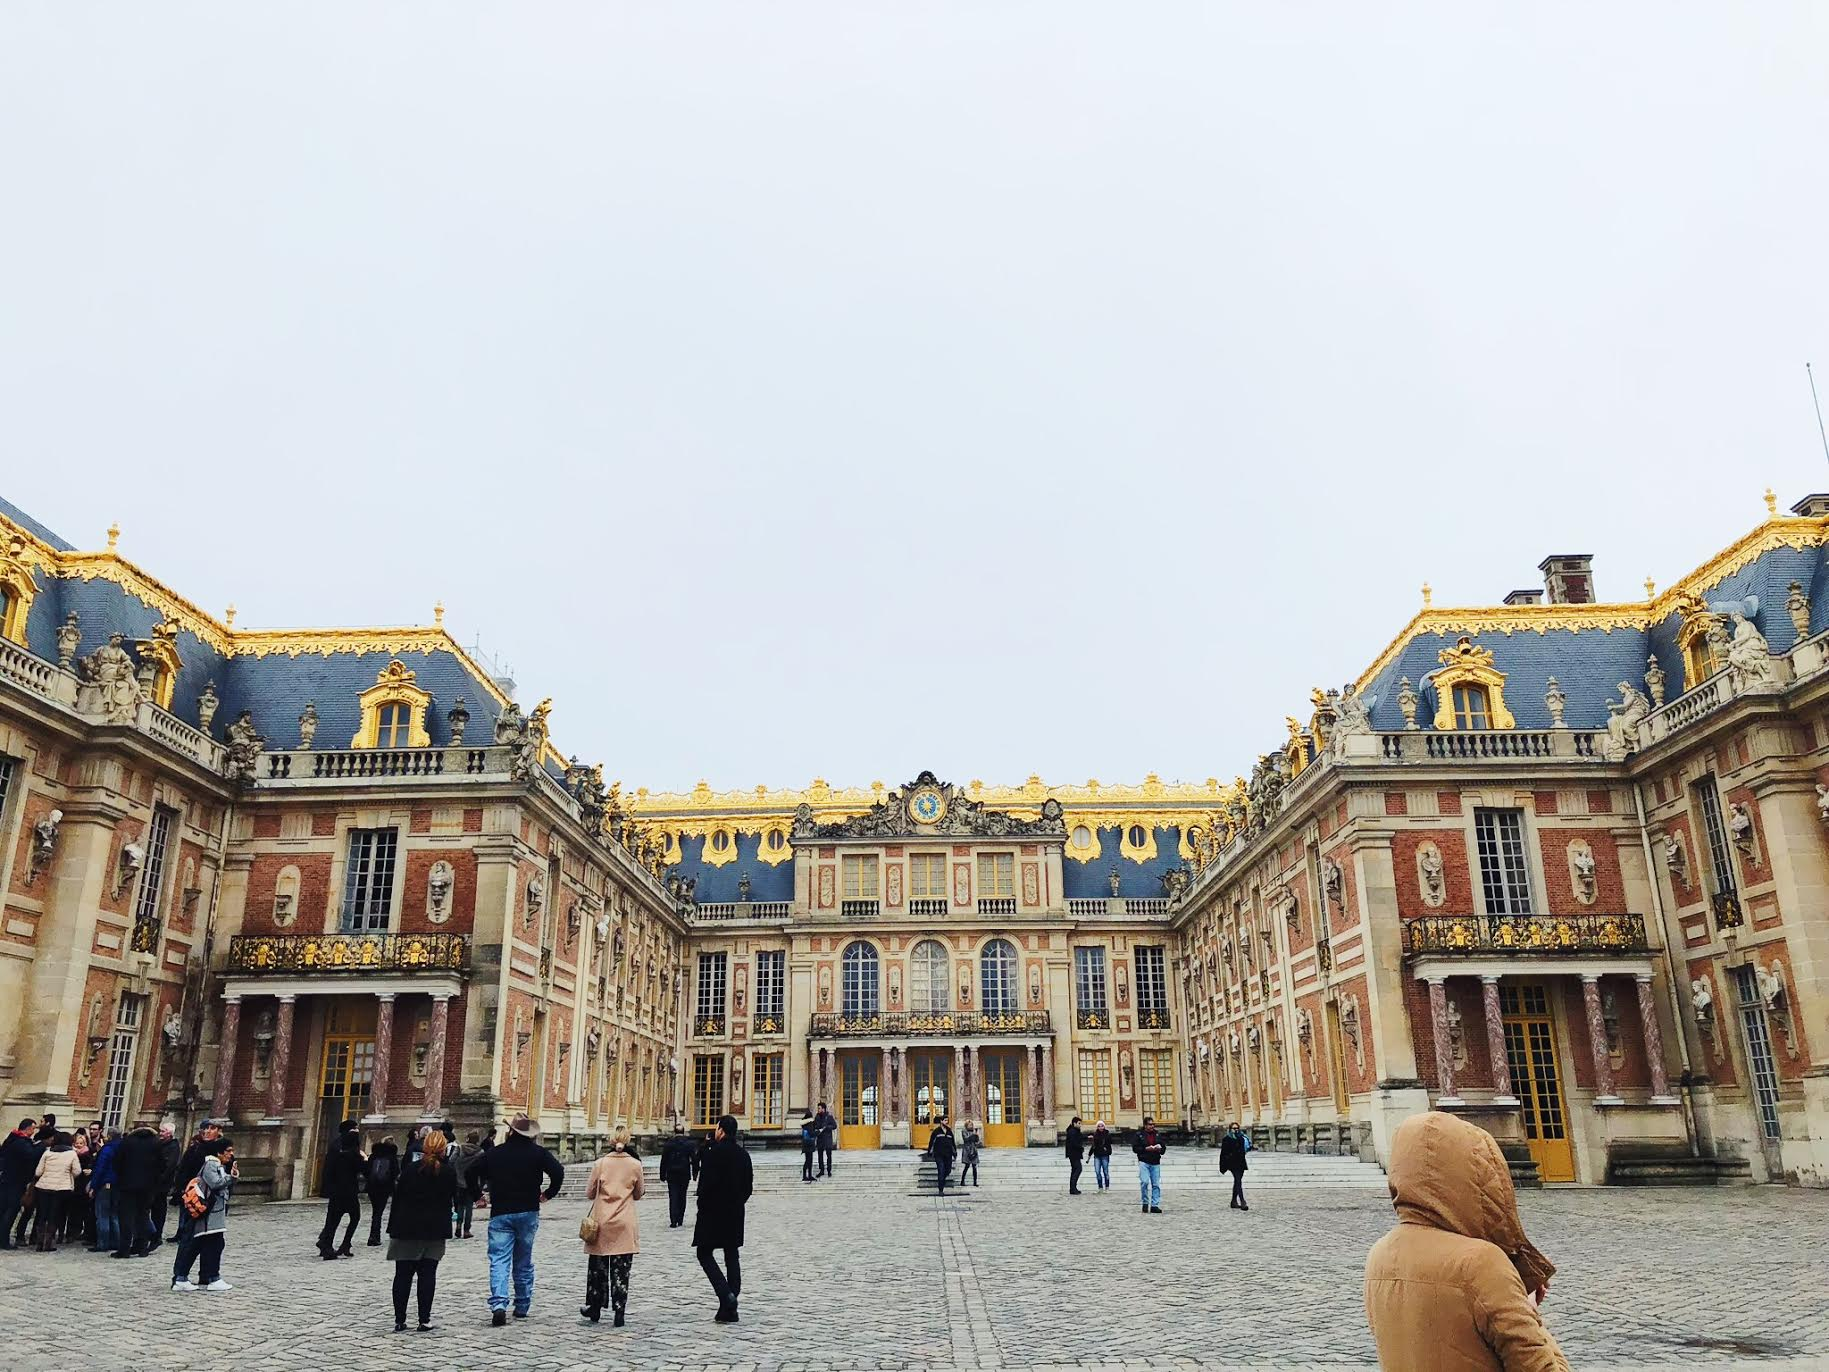 Muslim-travel-guide-Paris-Palace-of-Versailles.jpg